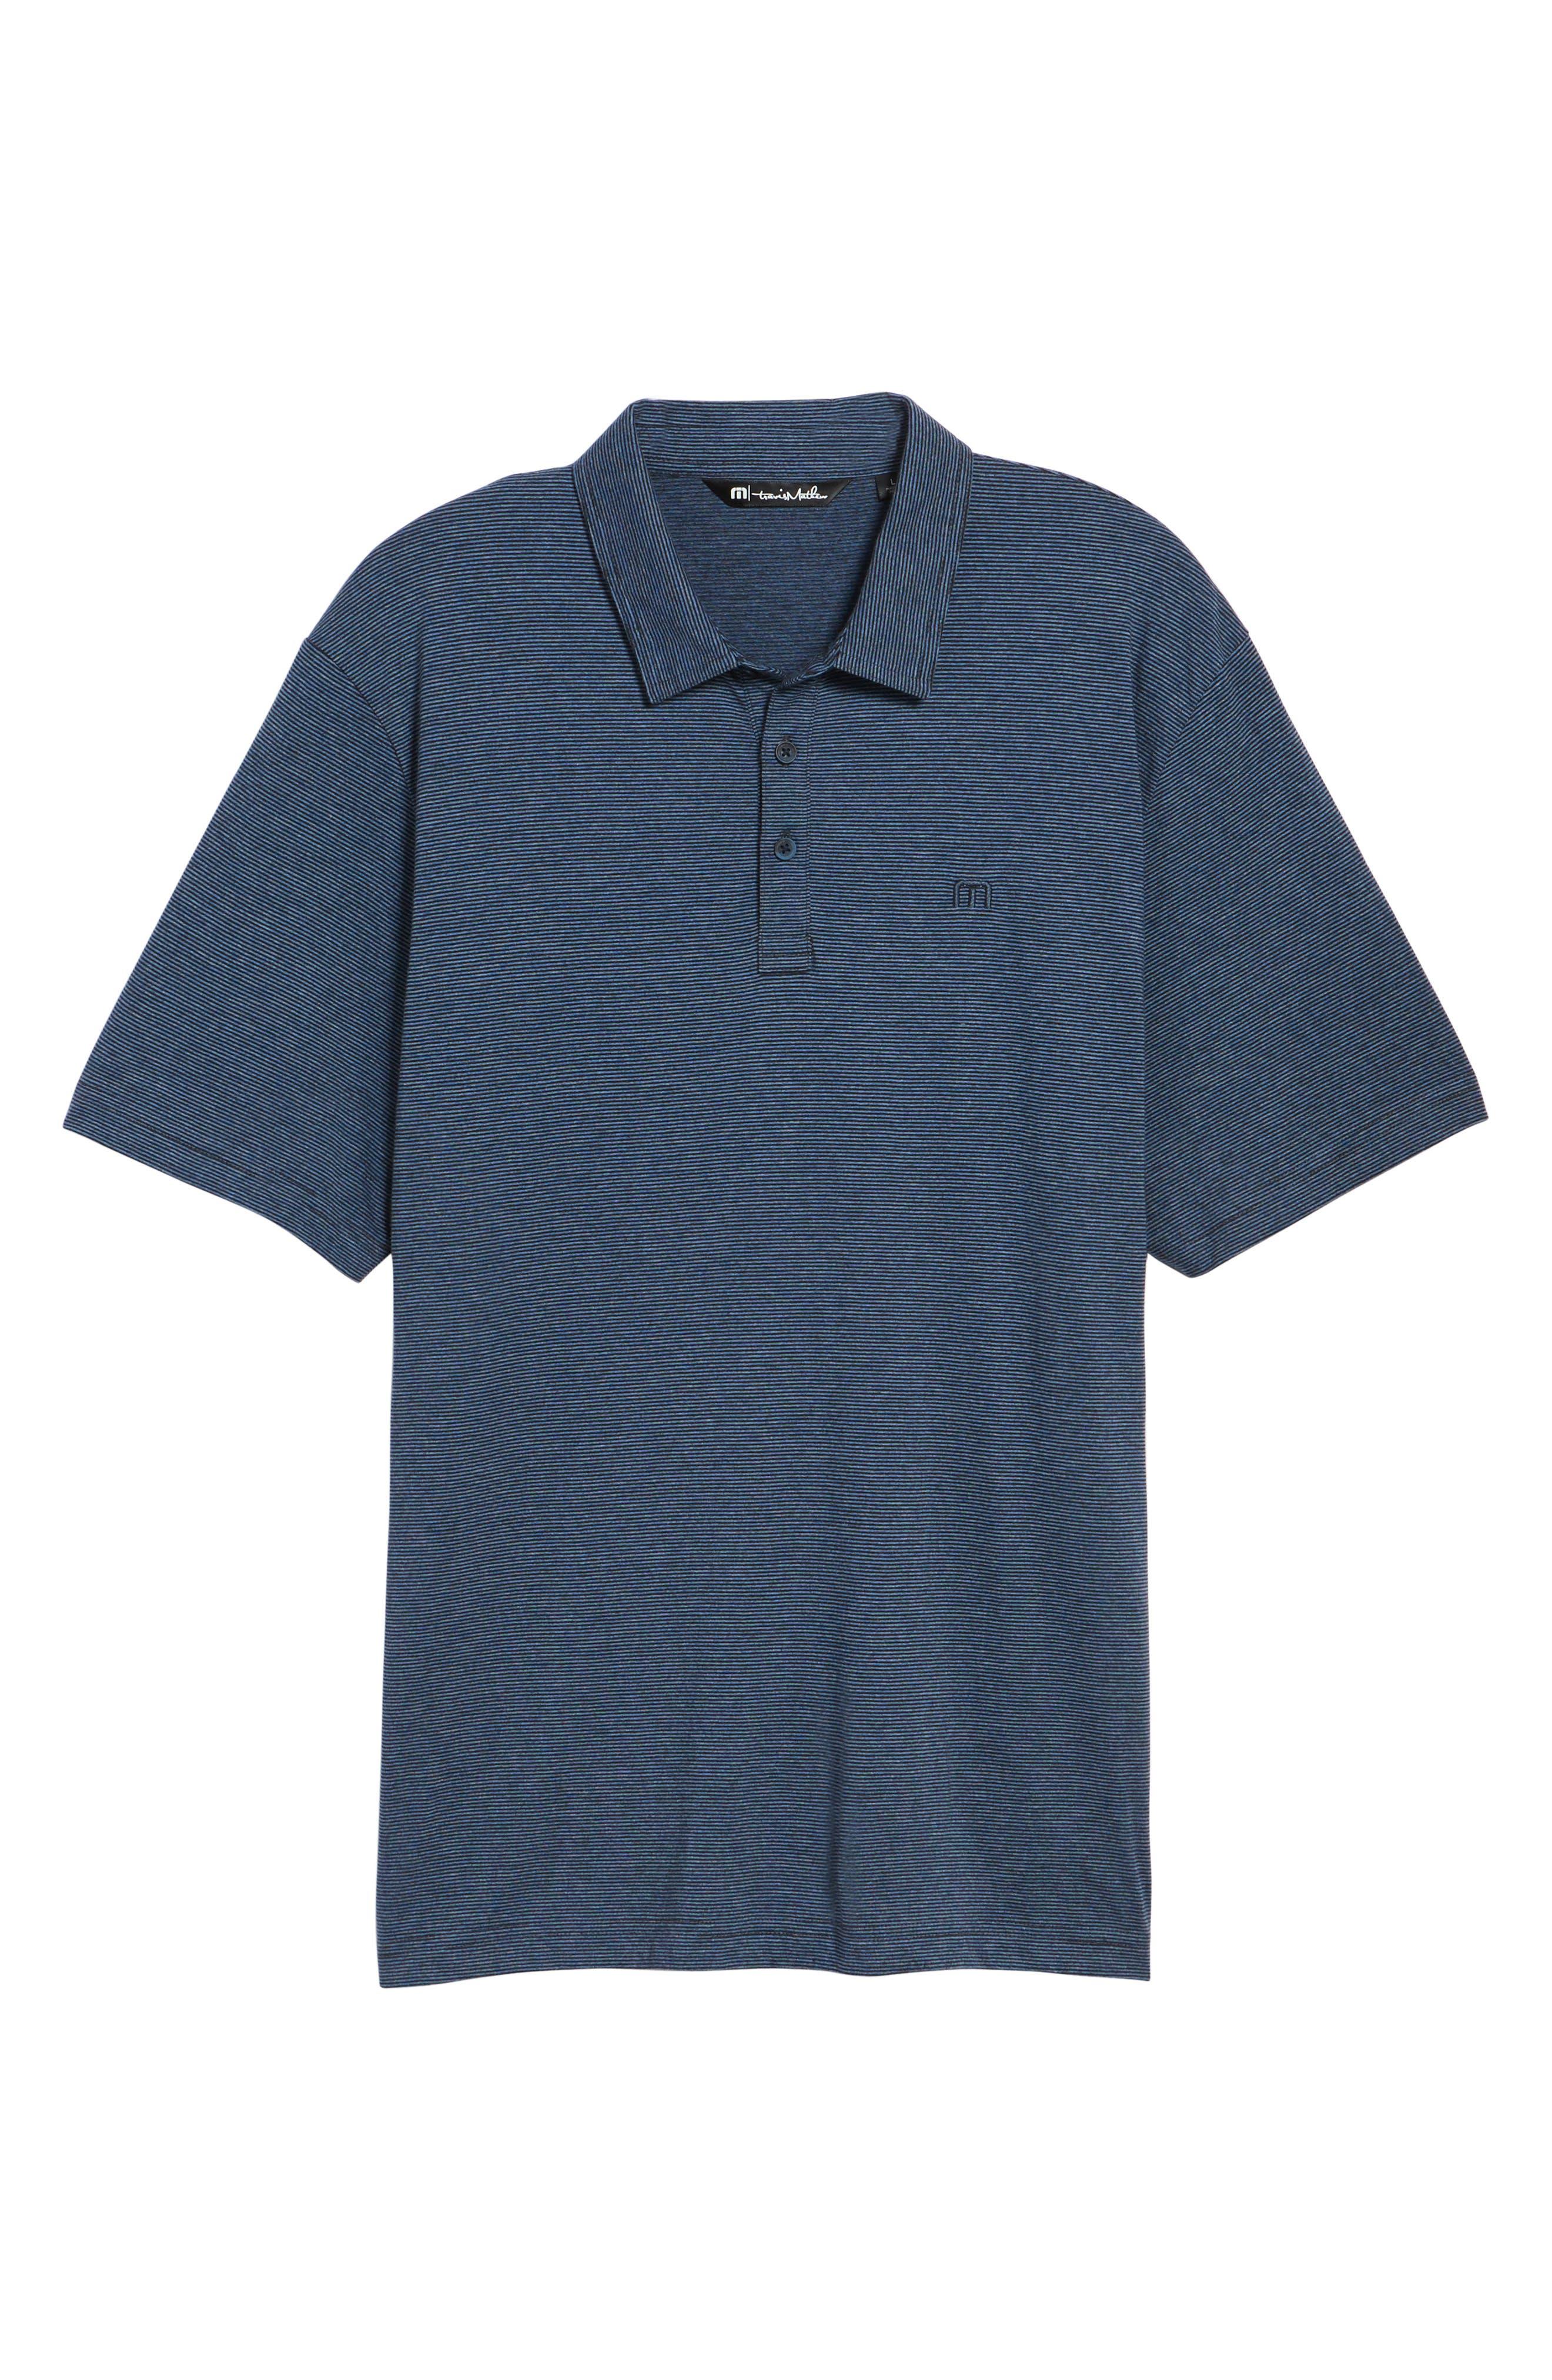 JQ Regular Fit Stripe Polo,                             Alternate thumbnail 6, color,                             Heather Blue Nights